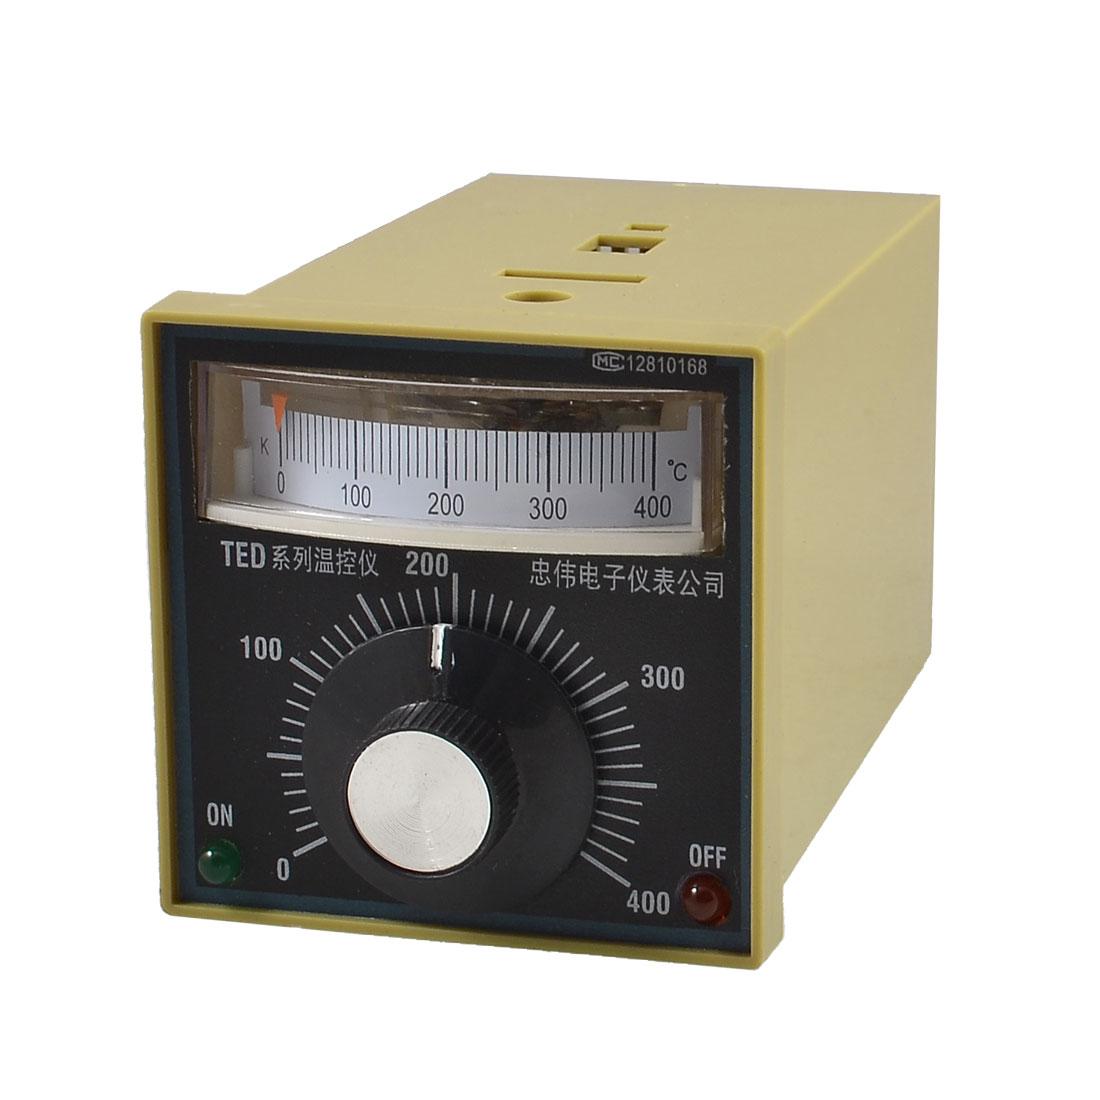 TED-2001 0-400 Celsius Deviation Indication Temperature Controller AC 220V